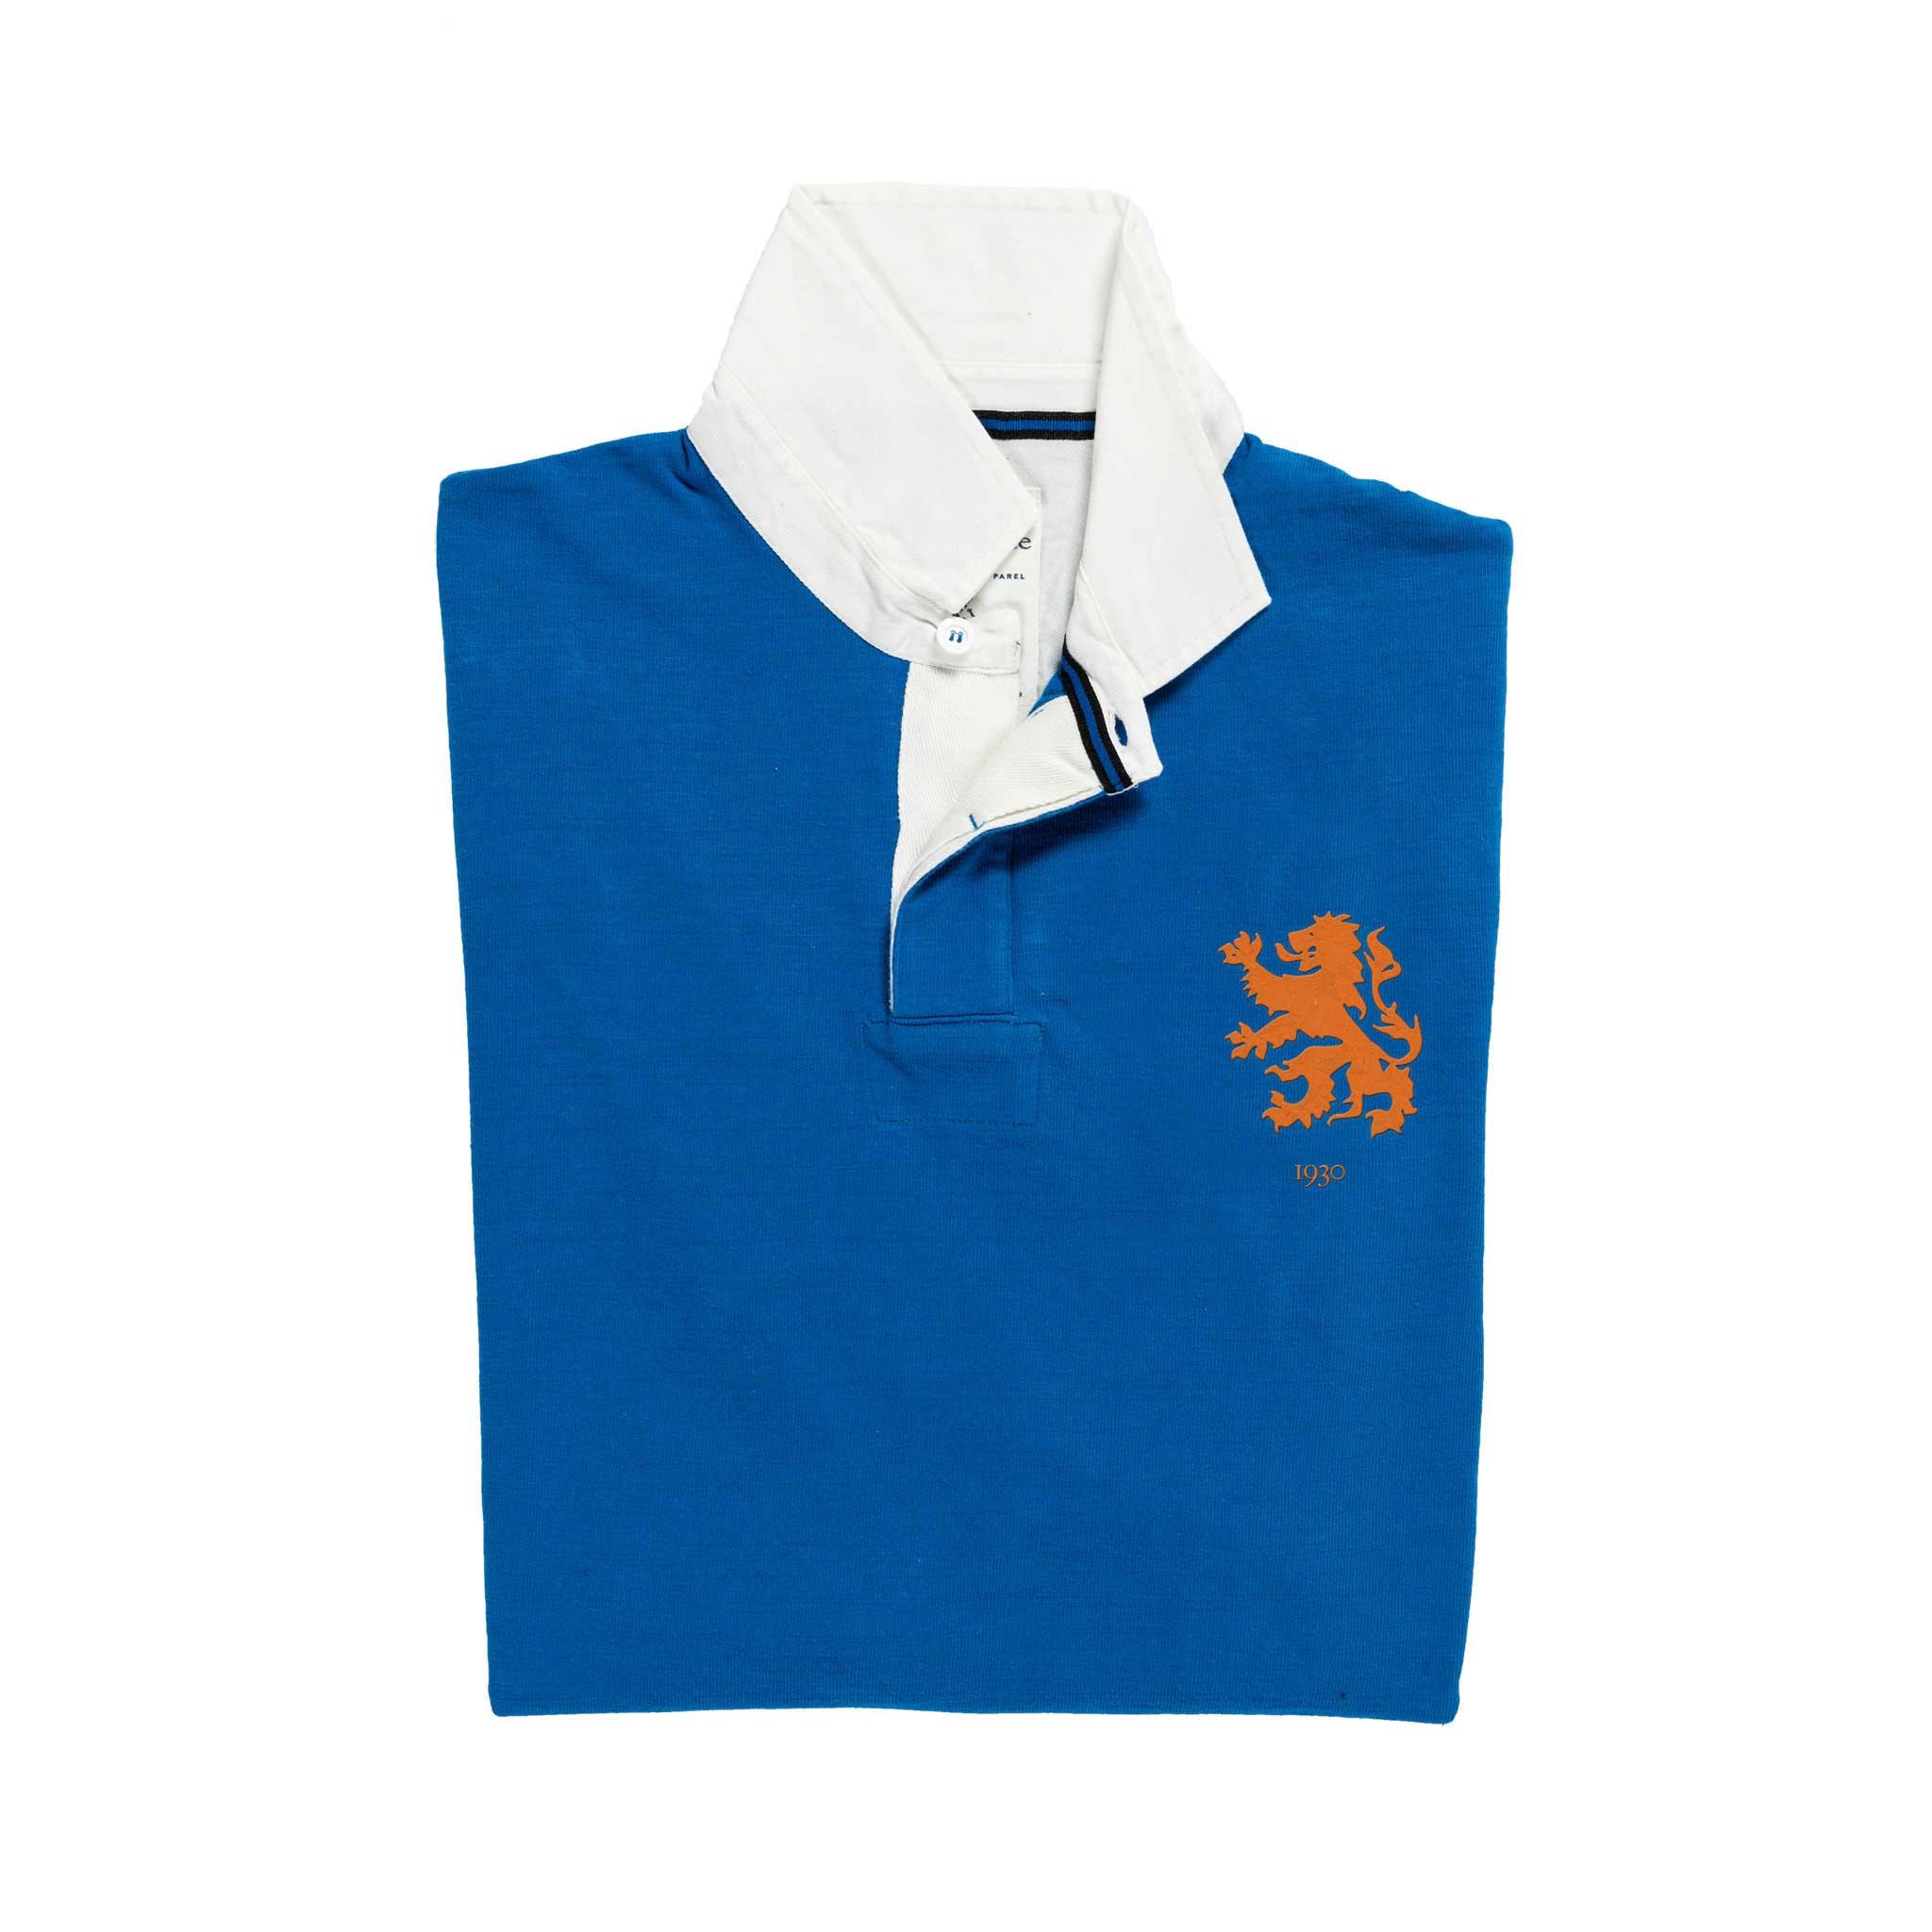 Netherlands 1930 Royal Blue Rugby Shirt_Folded